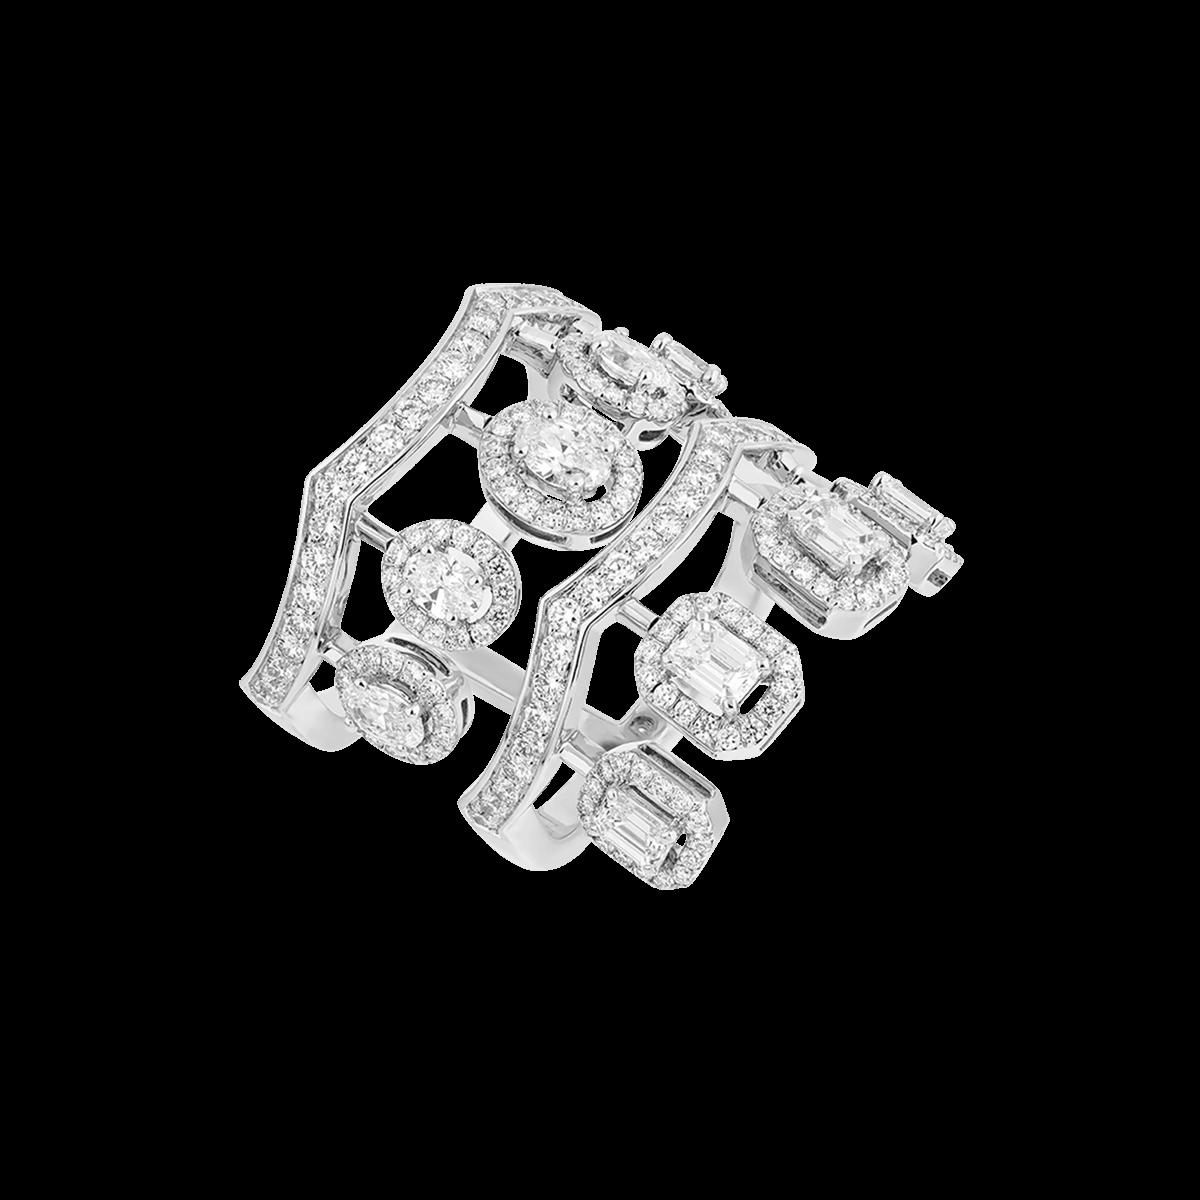 ariana white gold ring with diamonds